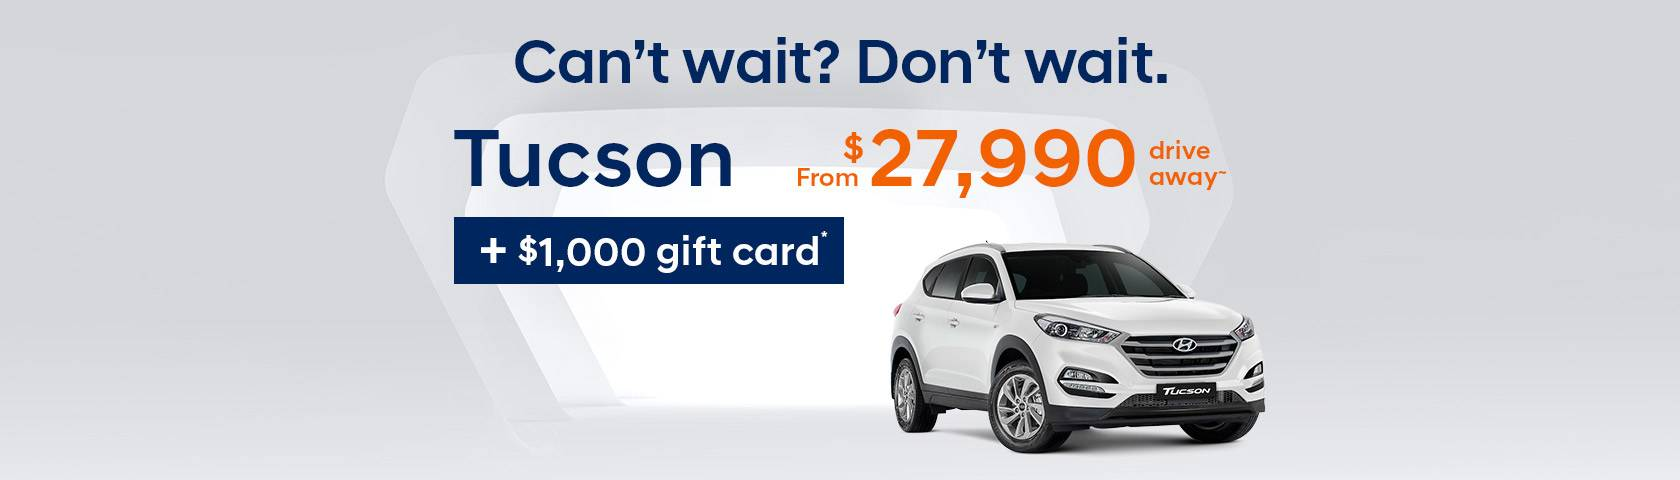 Hyundai Tucson Offer